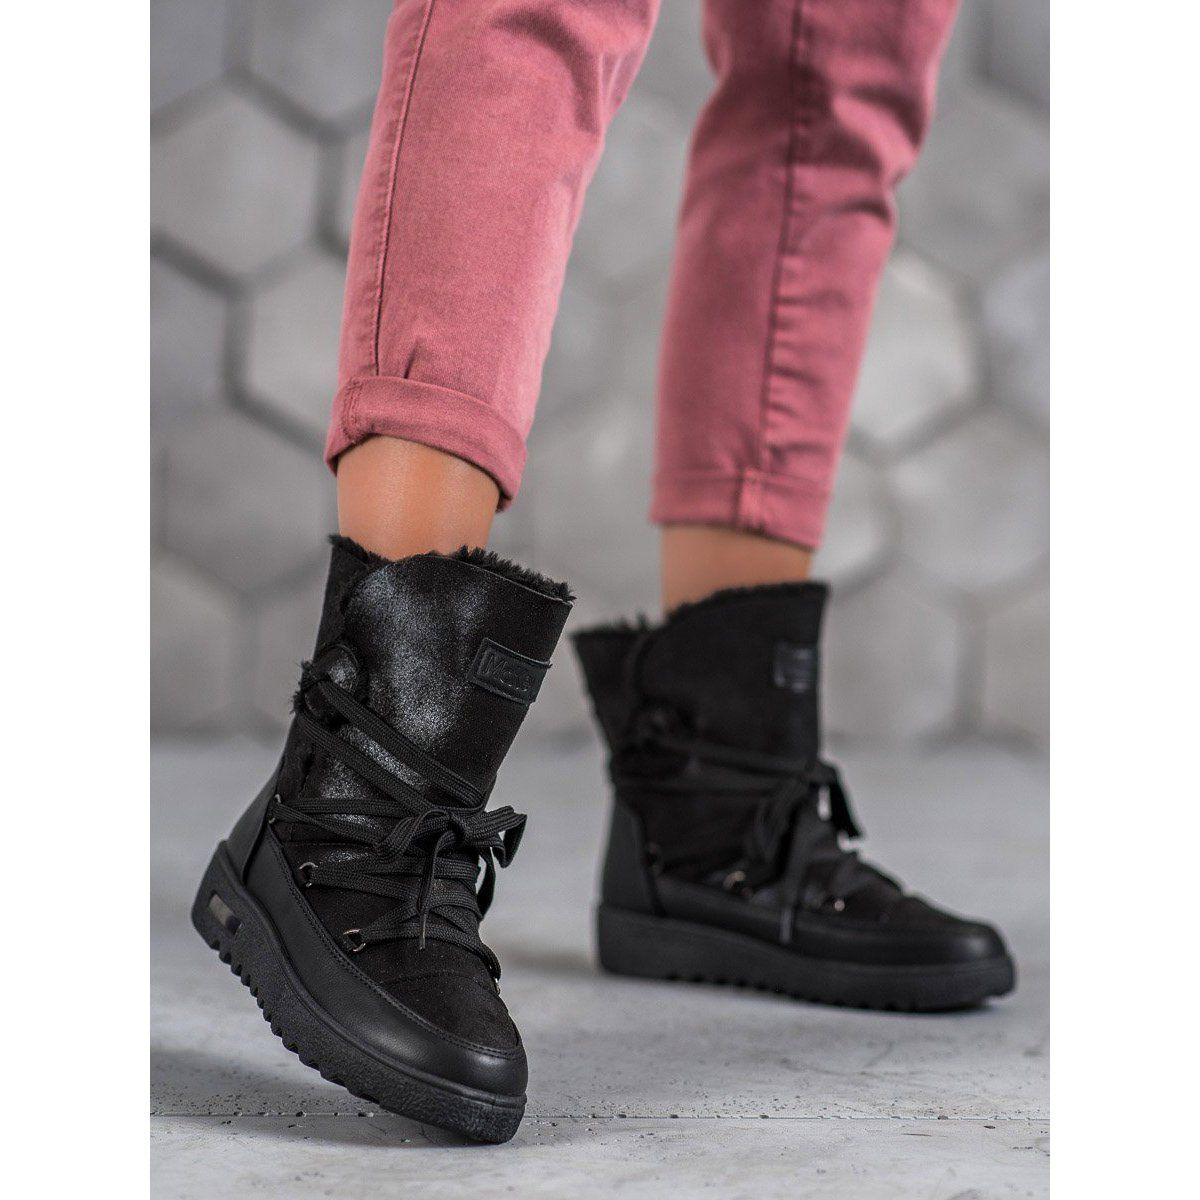 Niskie Workery Bikery Z Klamrami Biker Boot Boots Shoes